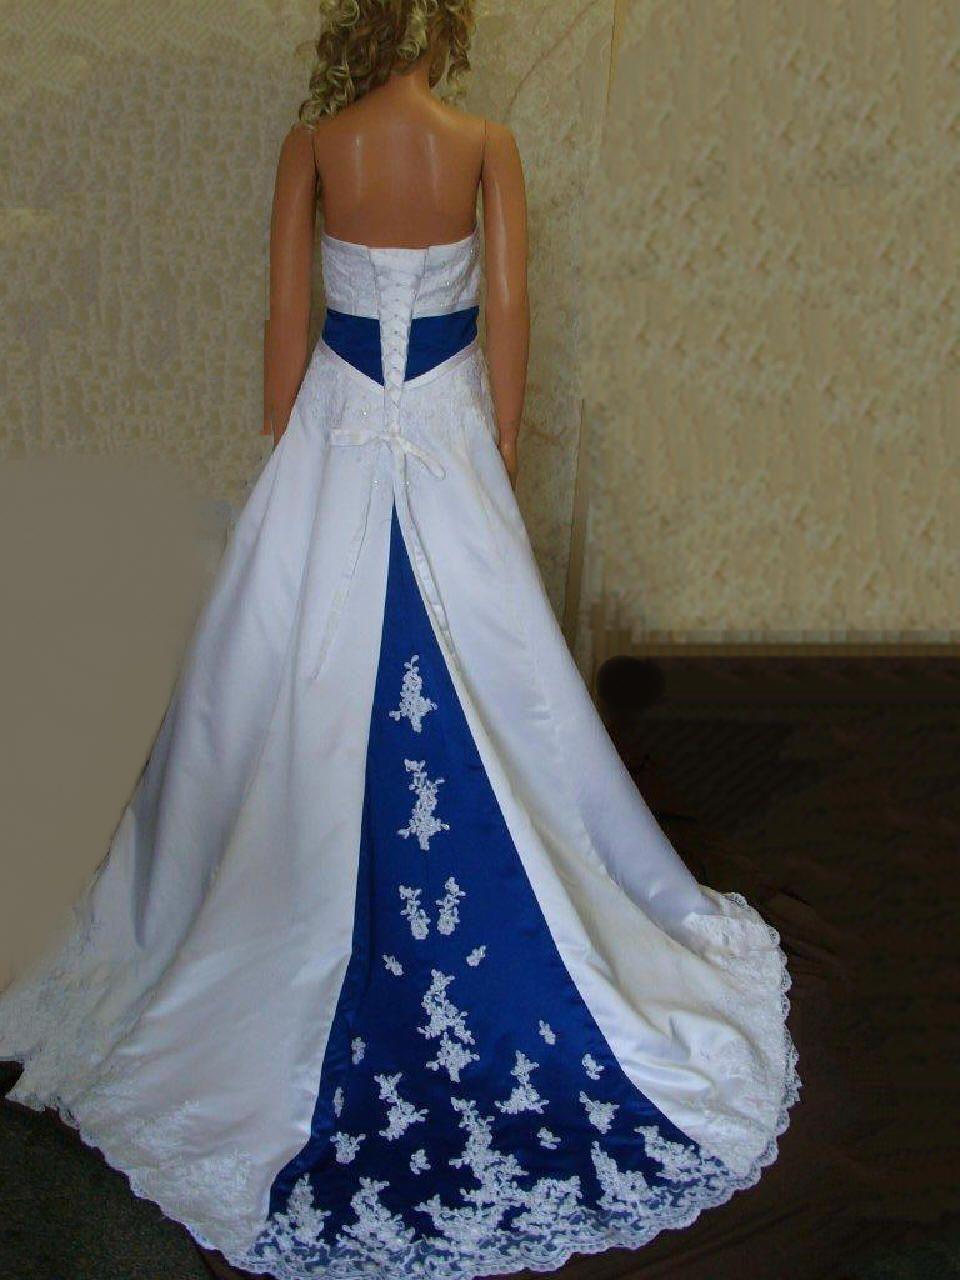 light blue wedding dress blue wedding dresses wedding gown Royal Blue Empireand train Wedding Dress